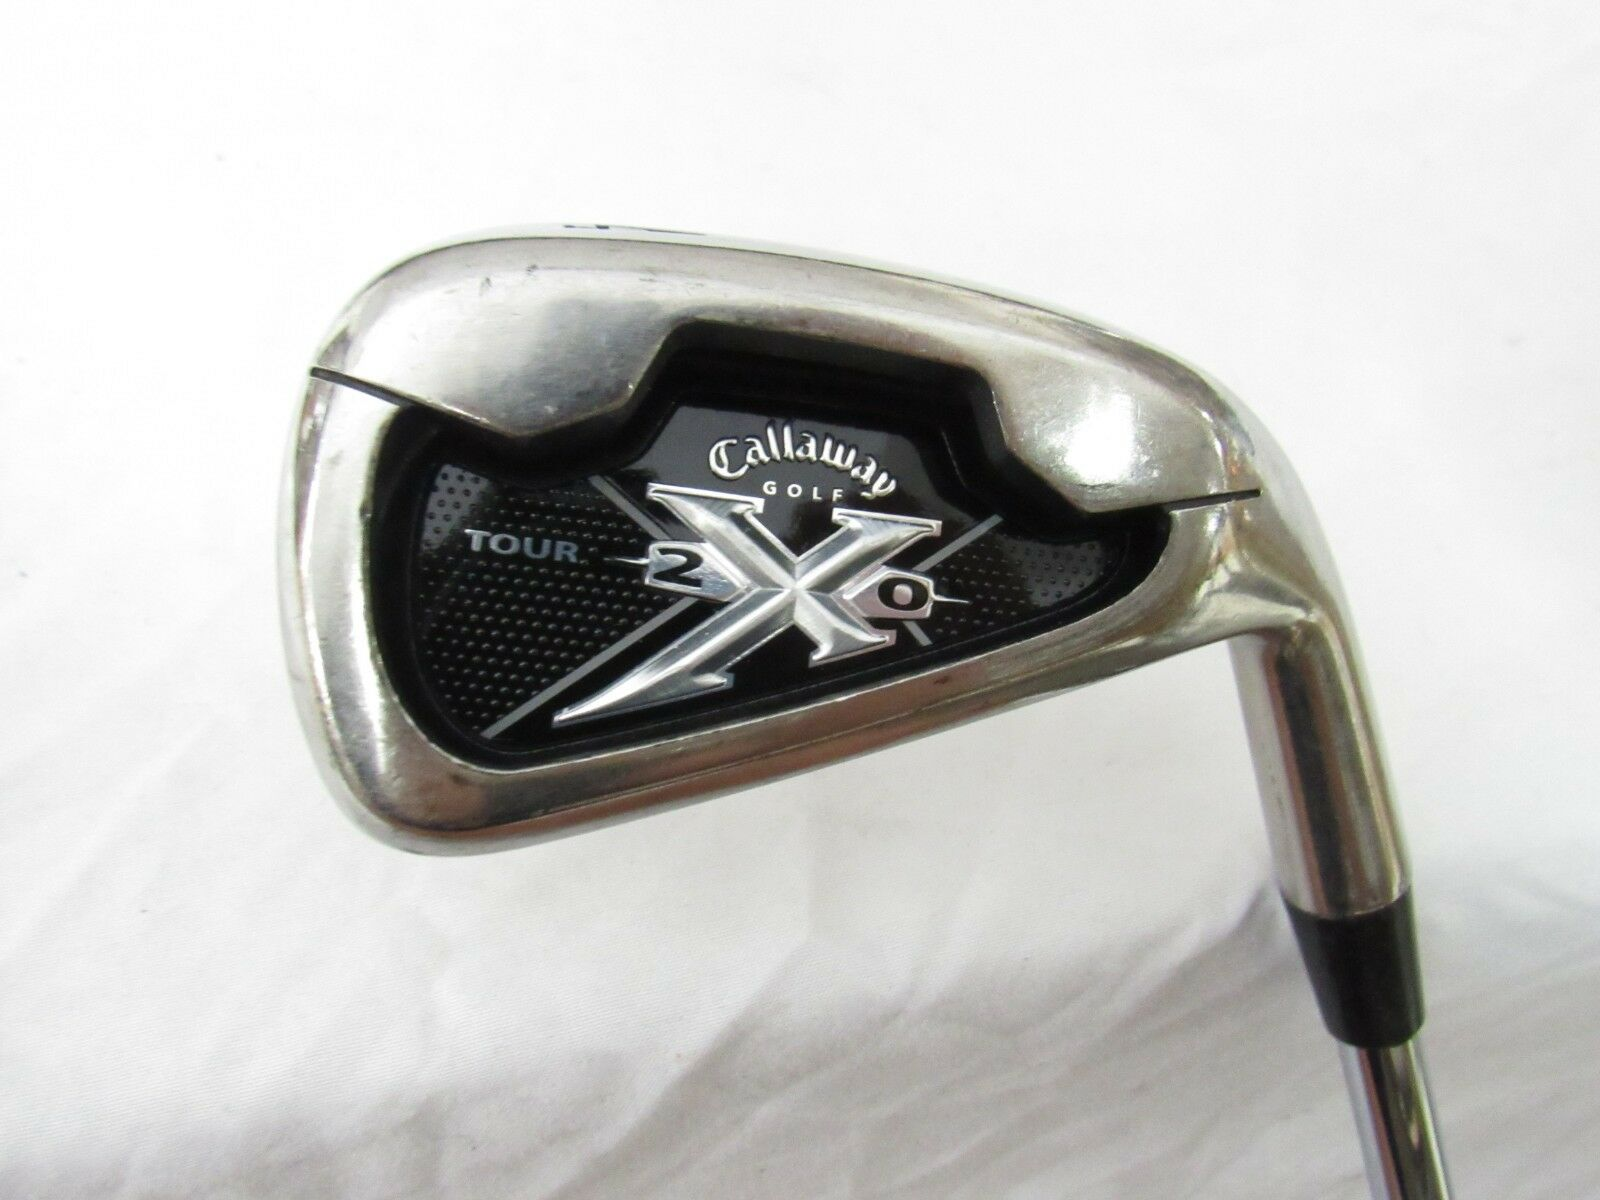 Used RH Callaway X-20 Tour Single 4 Iron Project X 5.0 Steel Regular Flex R